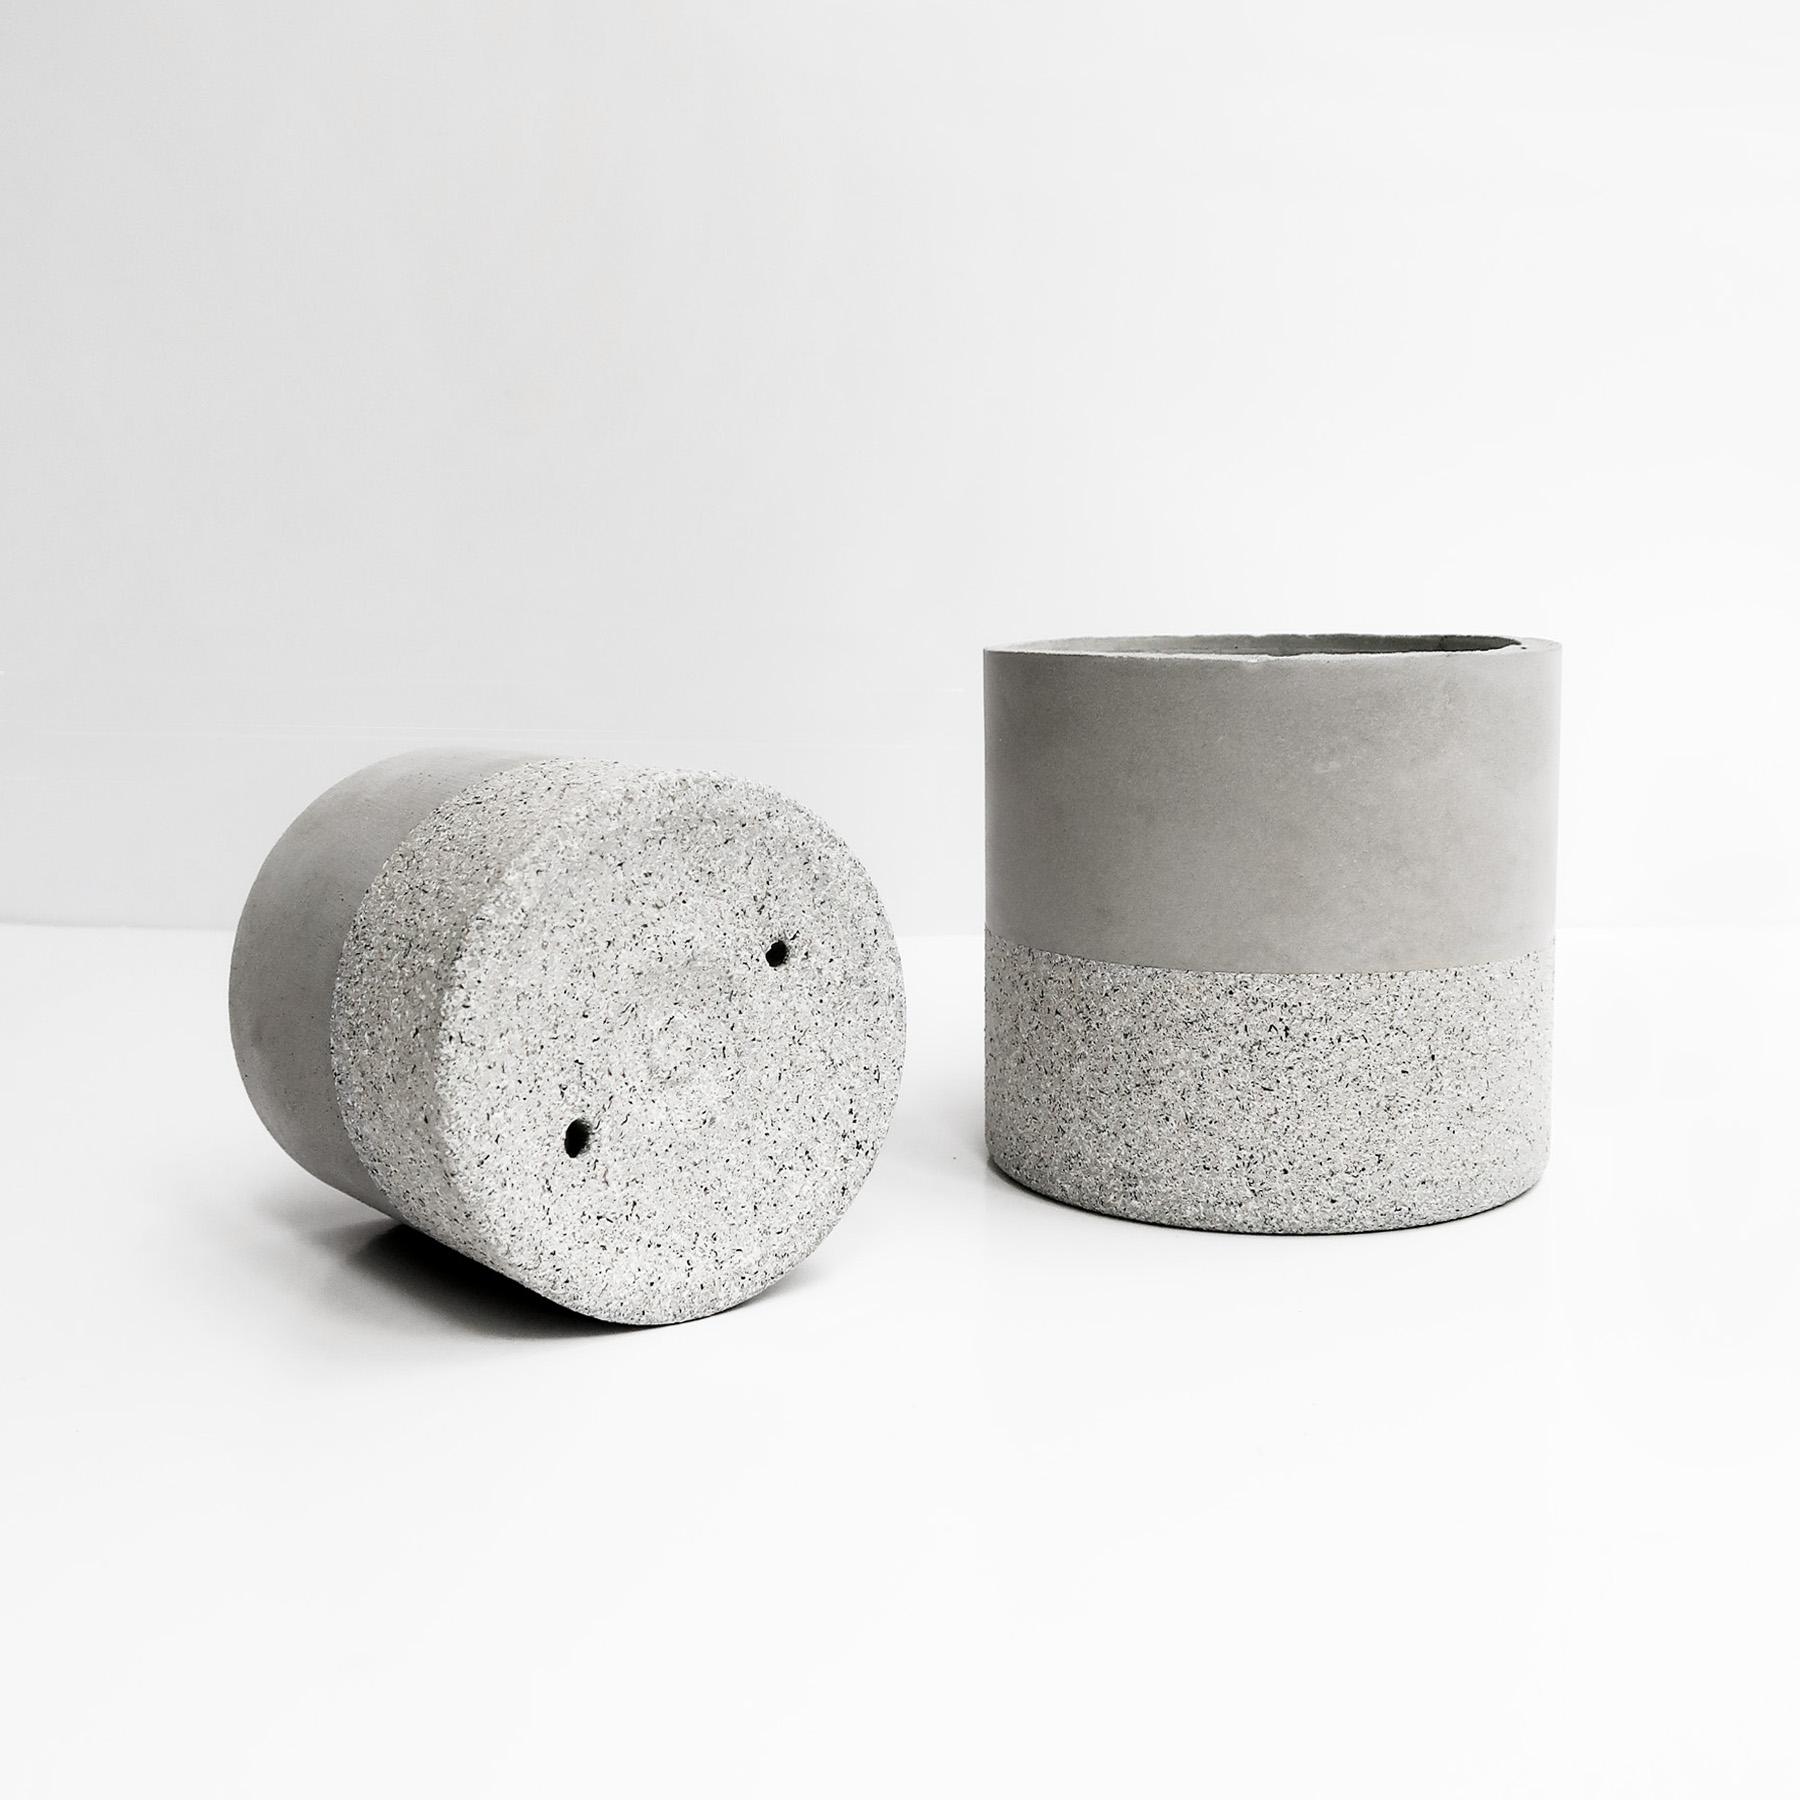 GRANITE 花崗岩等圓水泥設計家飾・盆器・盆栽